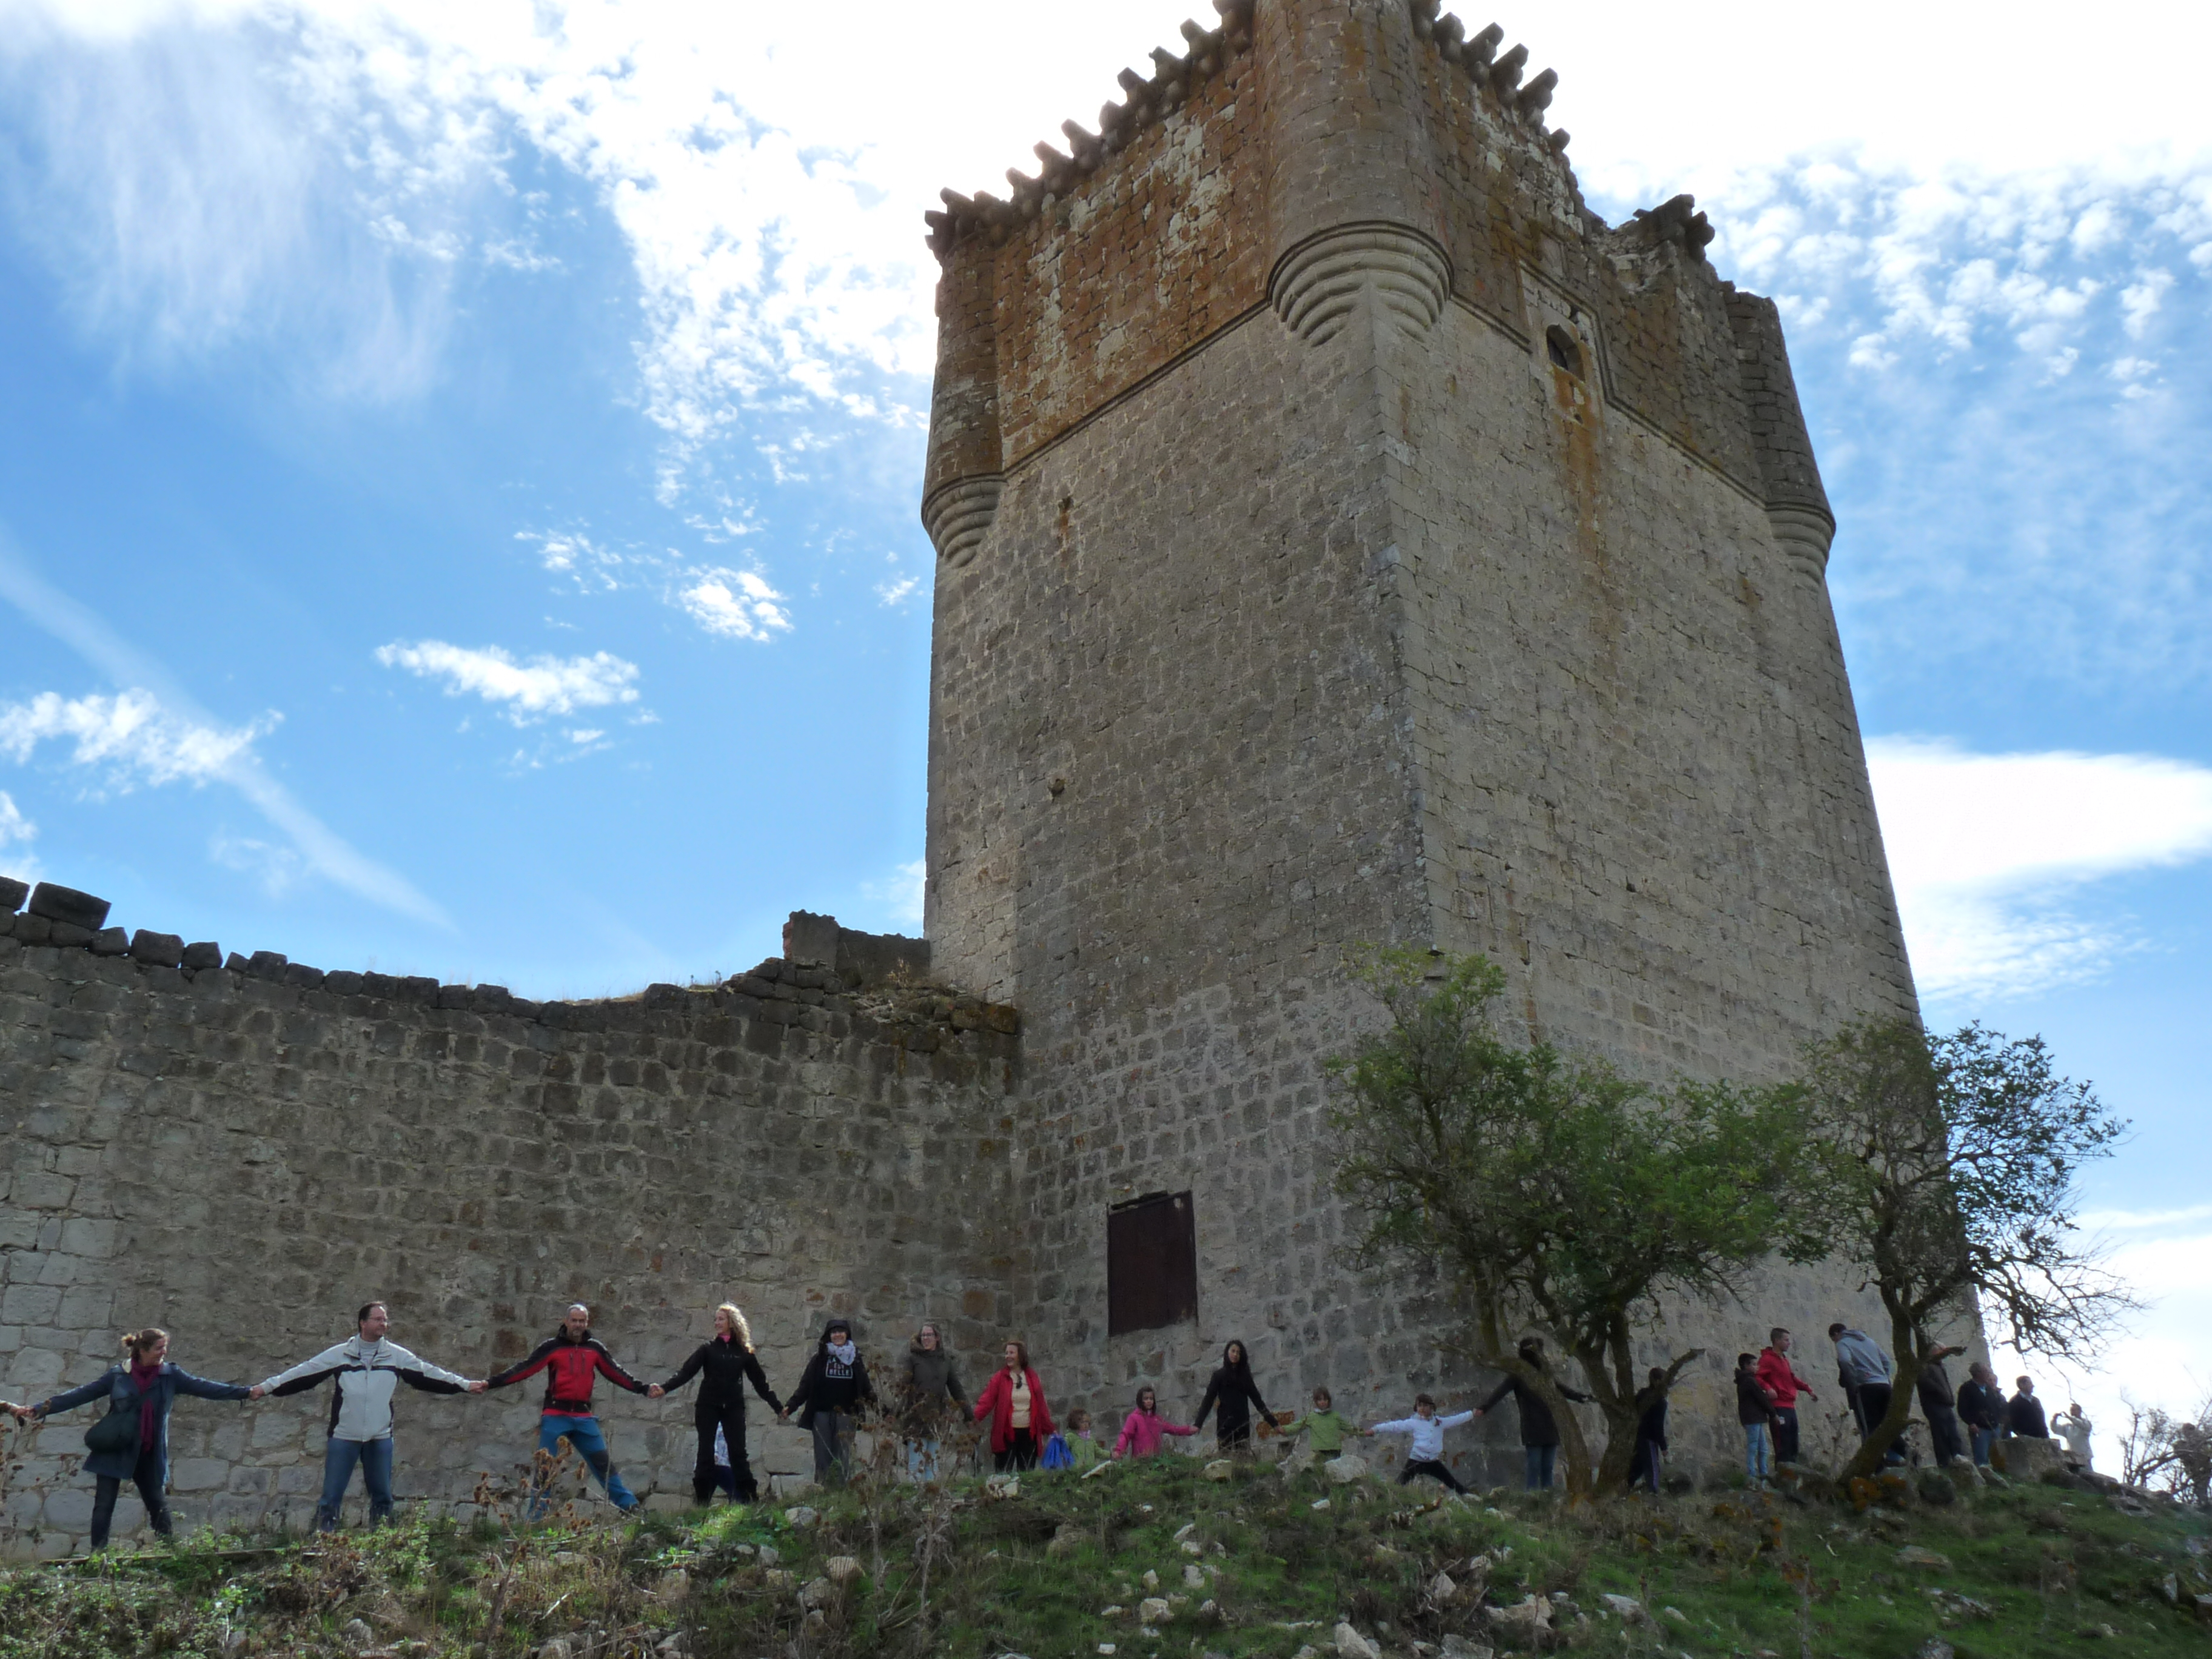 Cadena humana en el castillo de Galve